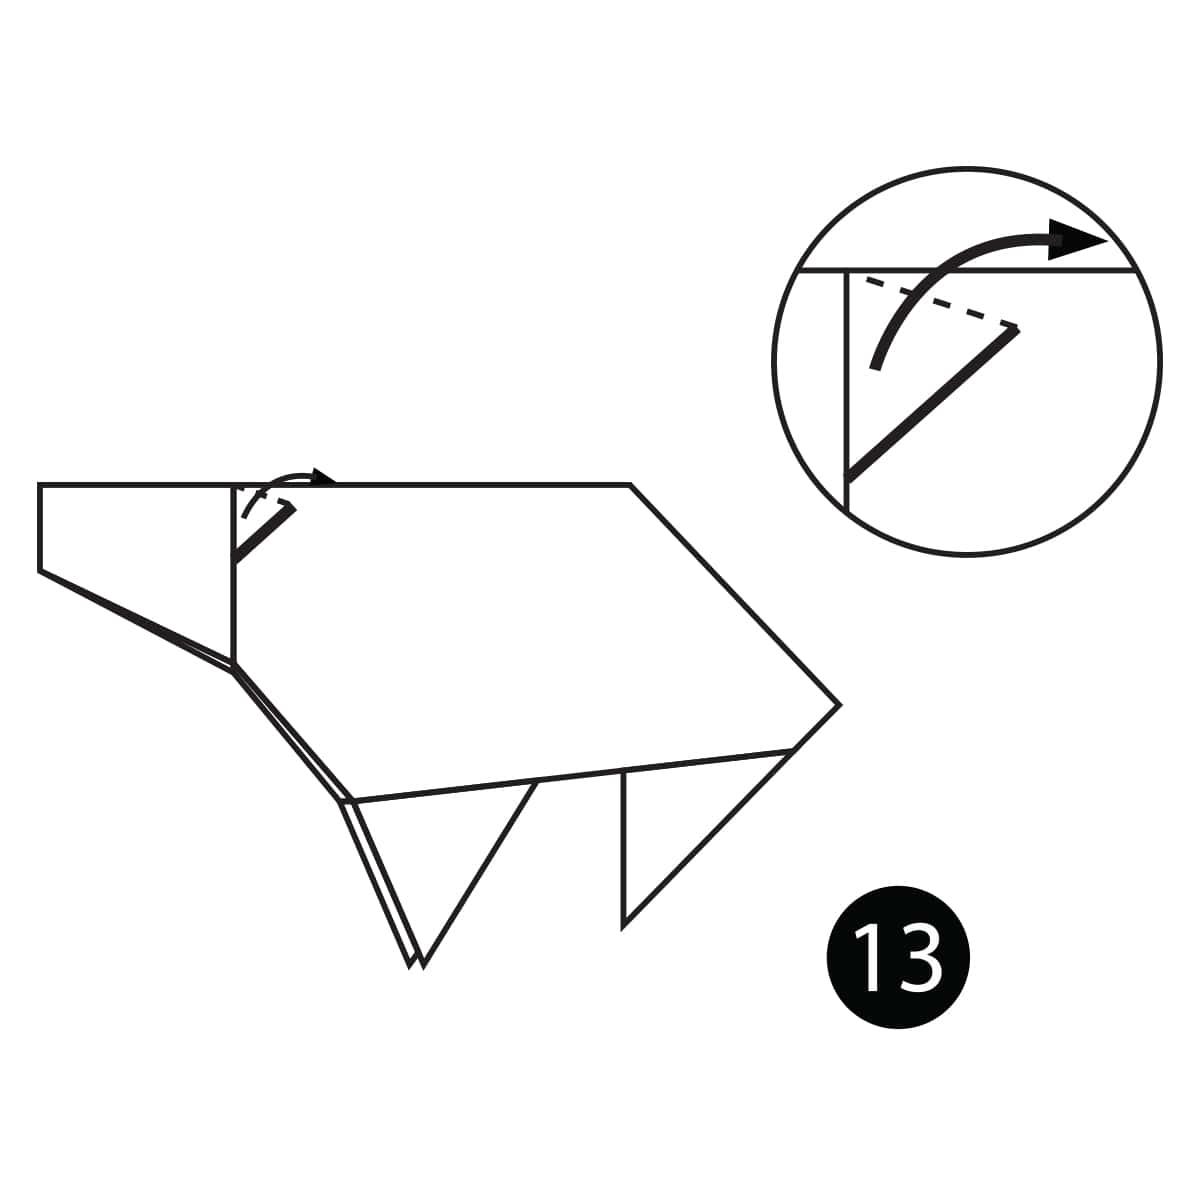 Cow Step 13